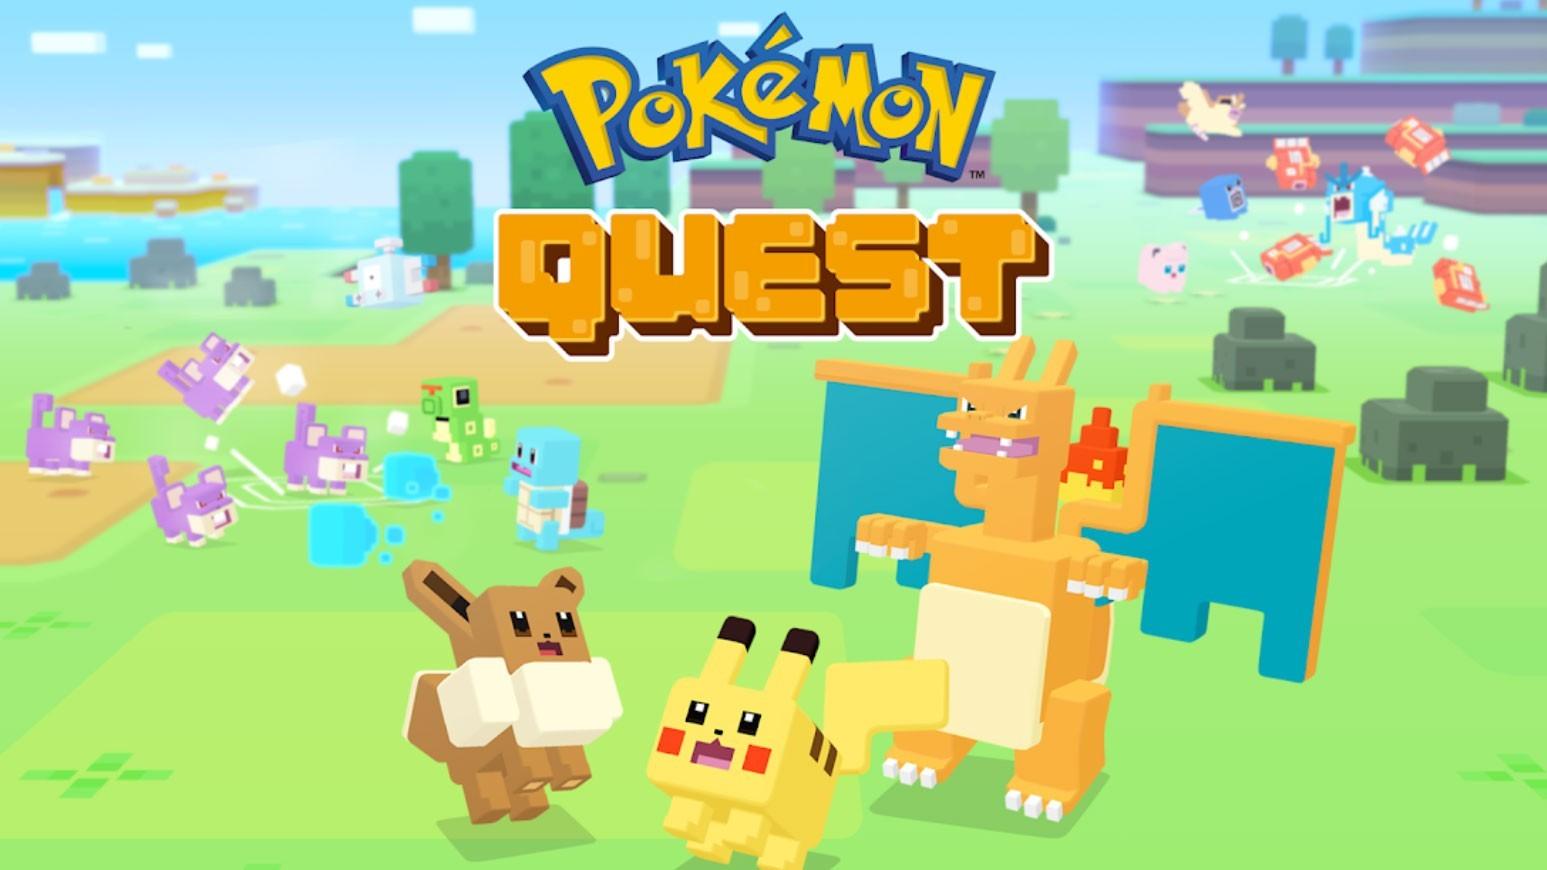 hon-75-trieu-luot-tai-game-pokemon-quest_1